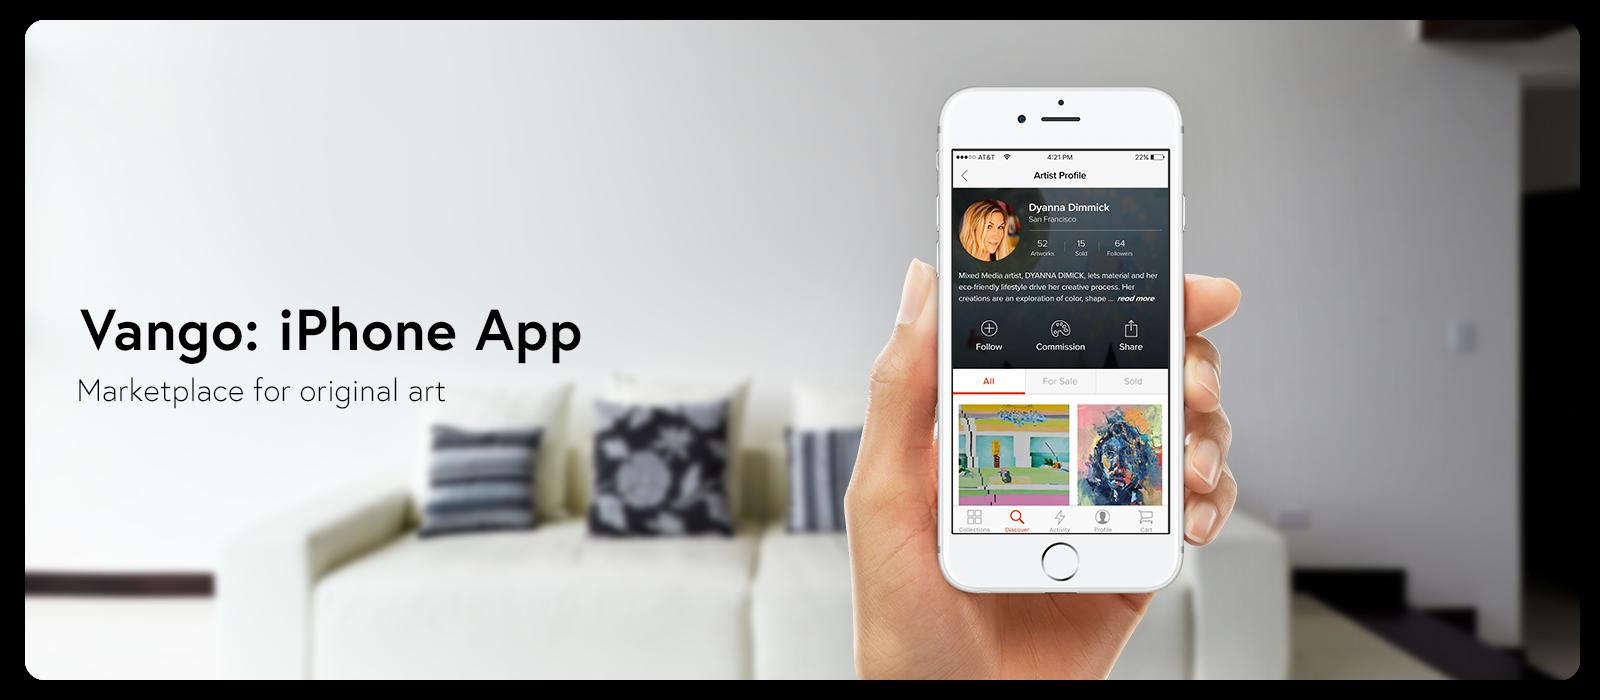 iphone-app-headers-large.png